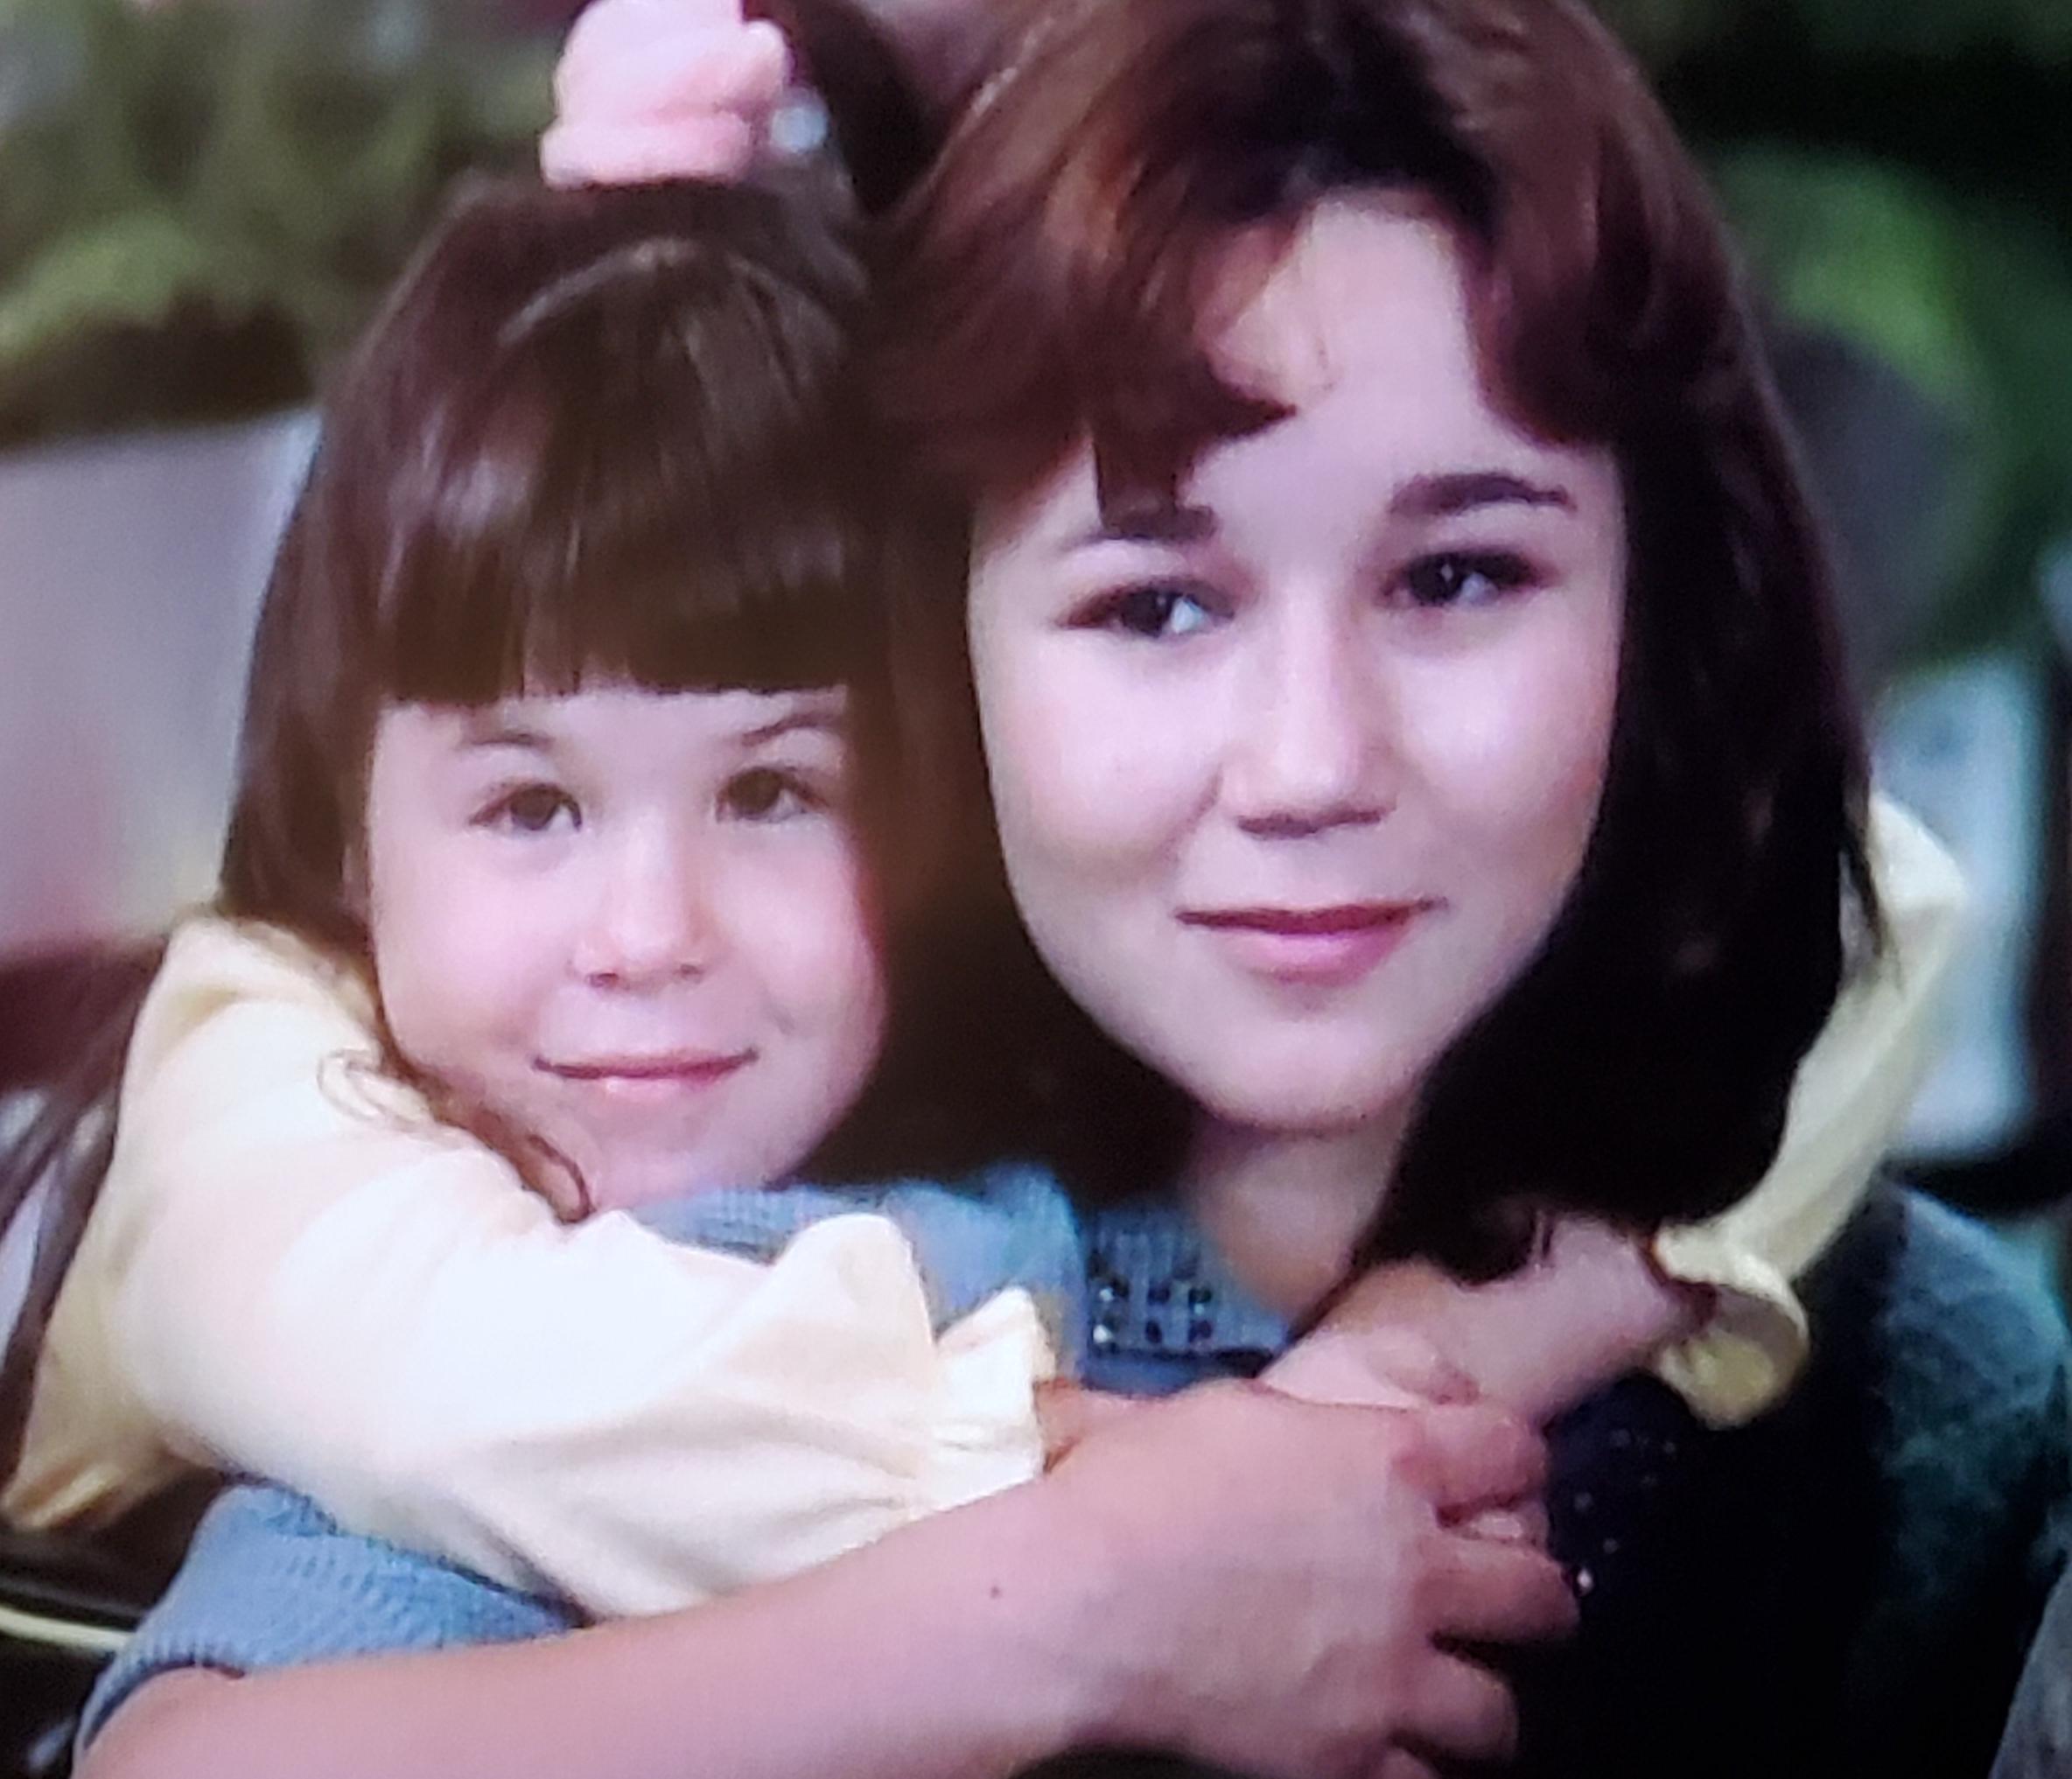 Blanca De Garr and Heidi Zeigler in Rags to Riches (1987)